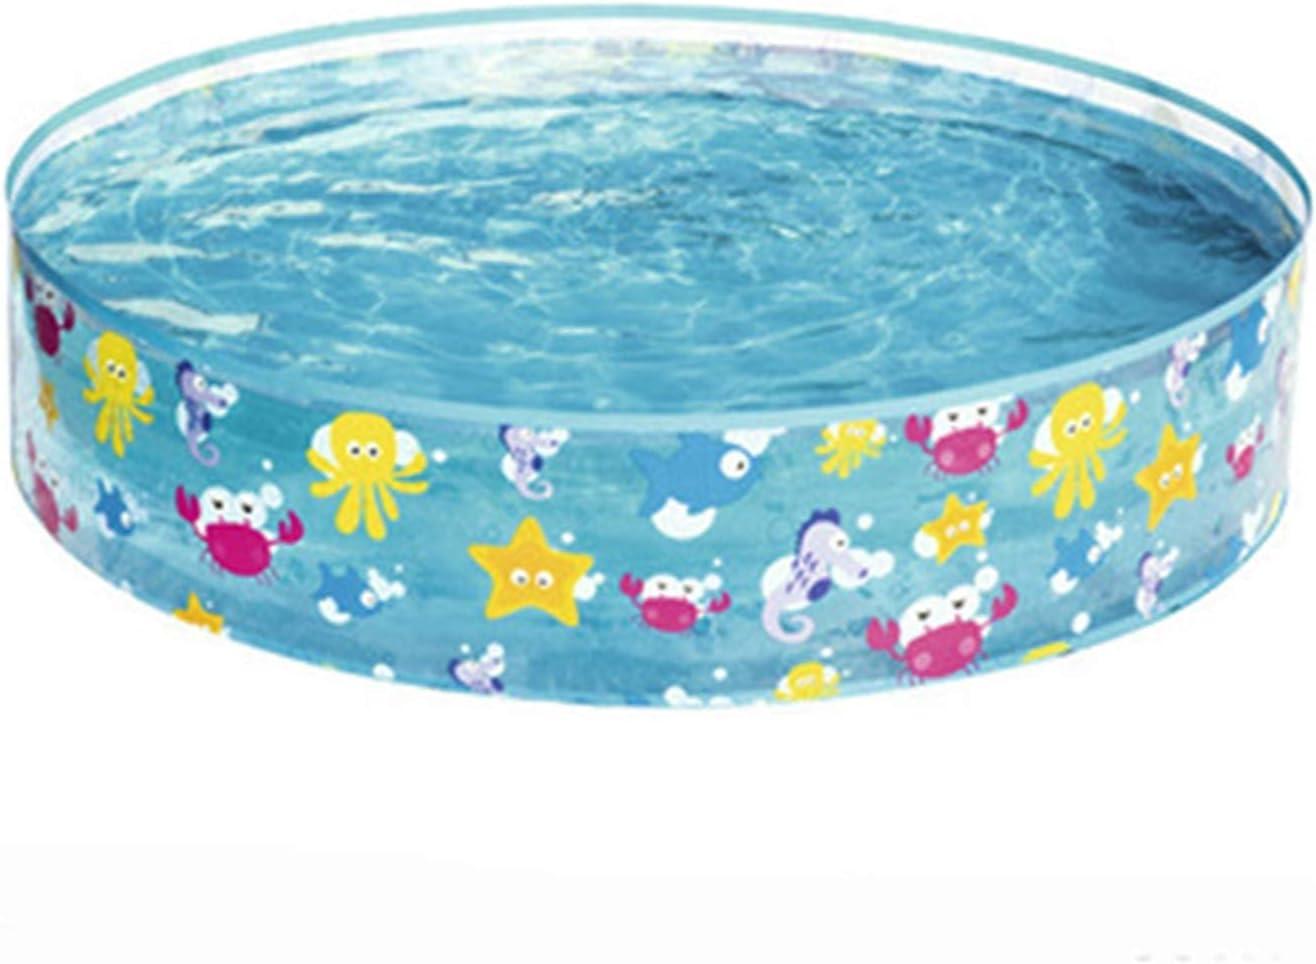 Piscina de plástico Duro Transparente, Piscina para niños, Piscina Familiar, Estanque de Peces, bañarse sin inflación